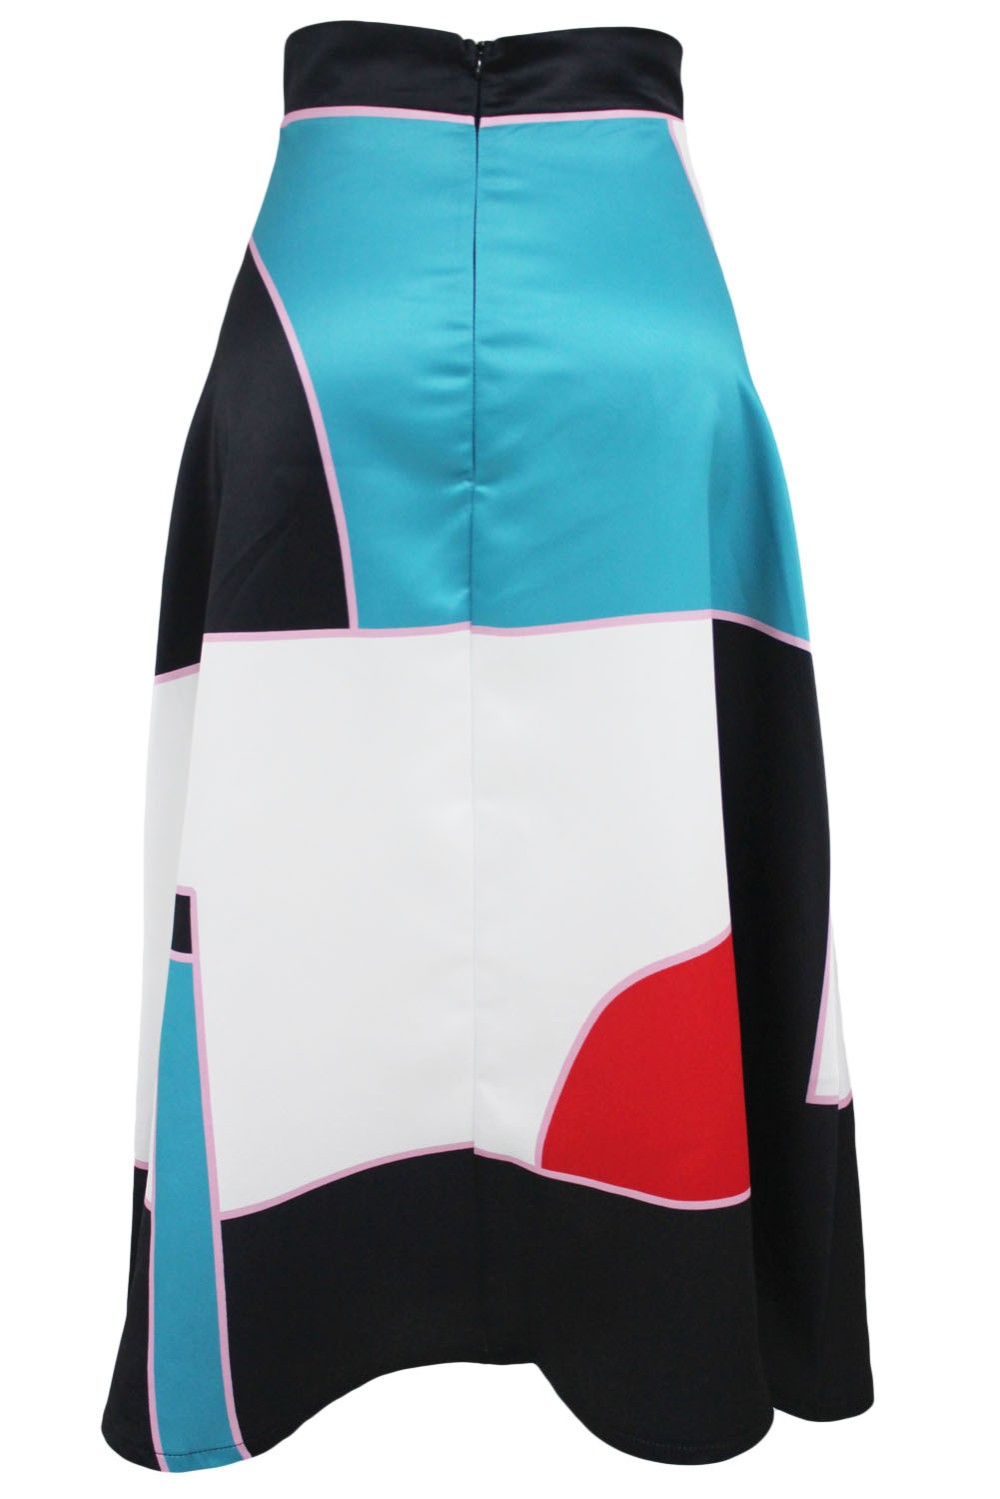 Irregular-Colorblock-Print-High-Waist-Maxi-Skirt-LC65017-22-6